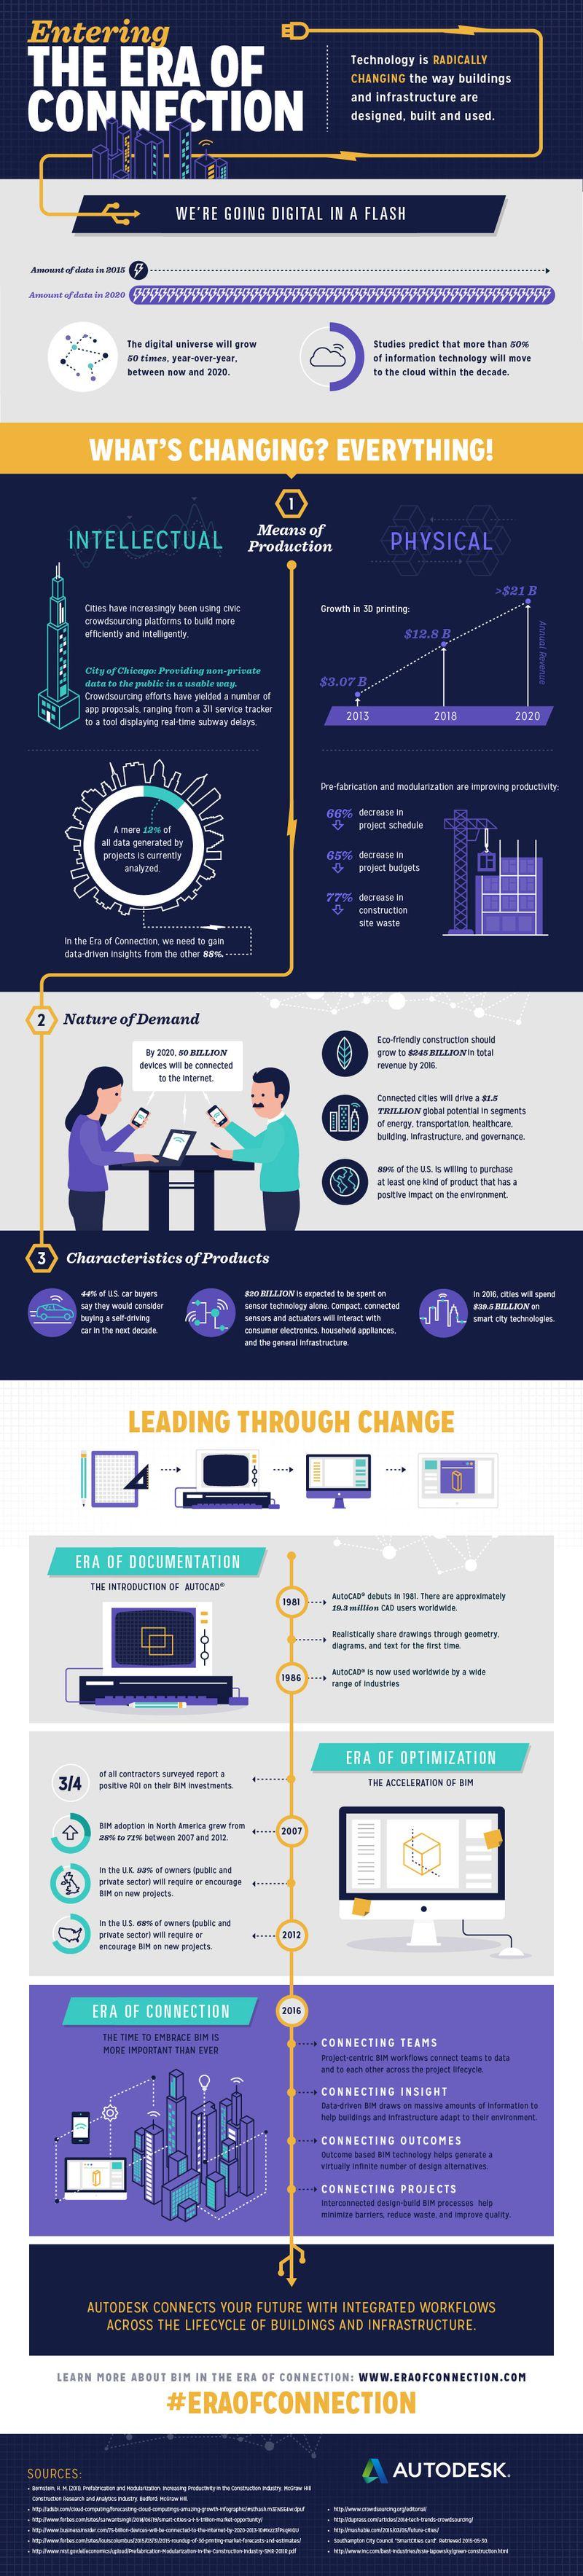 autodesk era of connection infographic